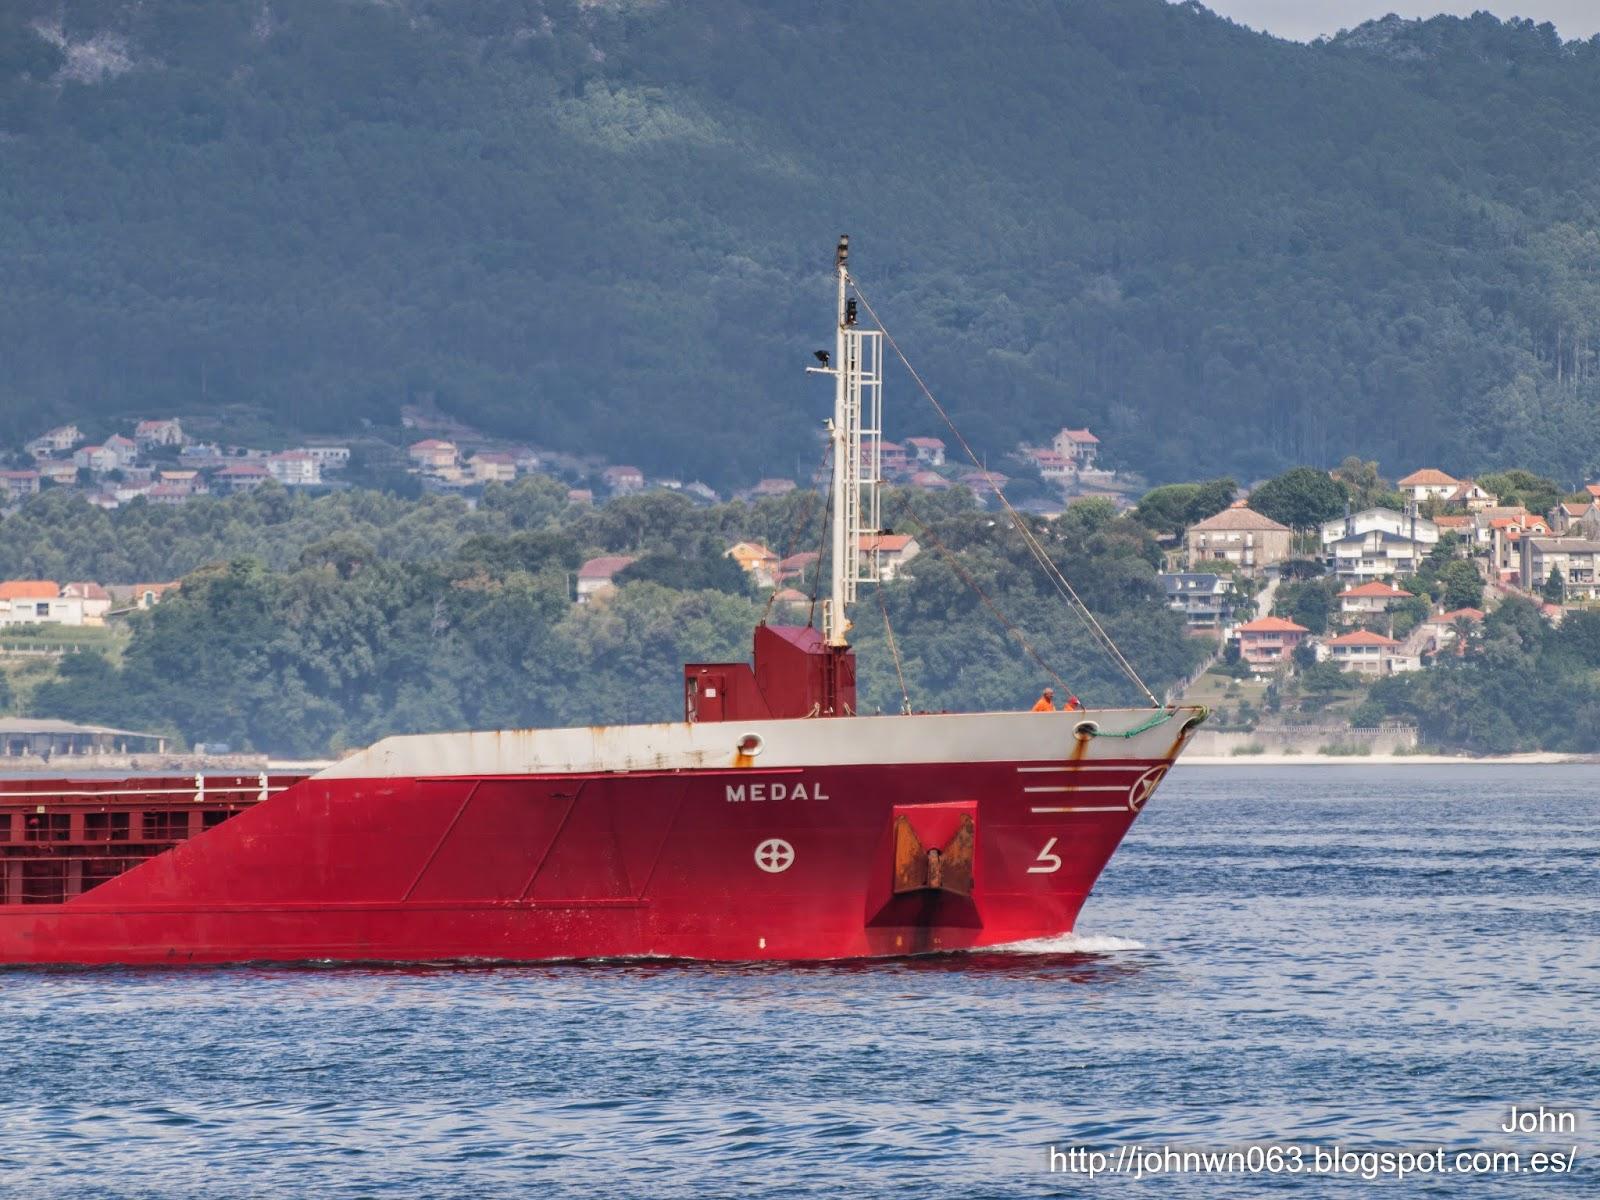 fotos de barcos, imagenes de barcos, medal, naviera murueta, carga general, vigo